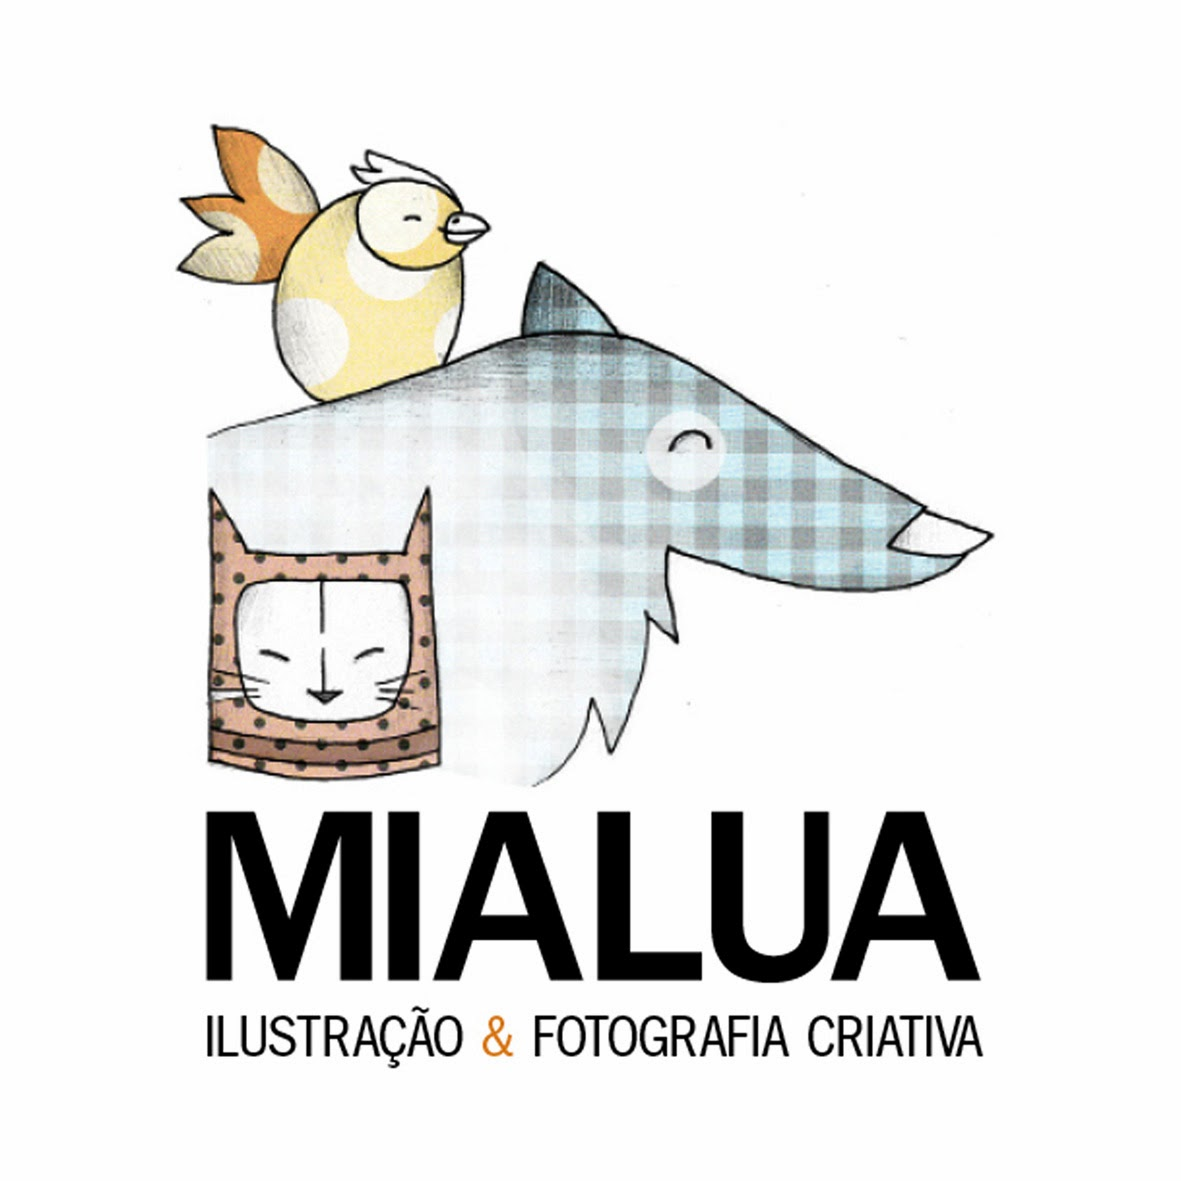 Mialua